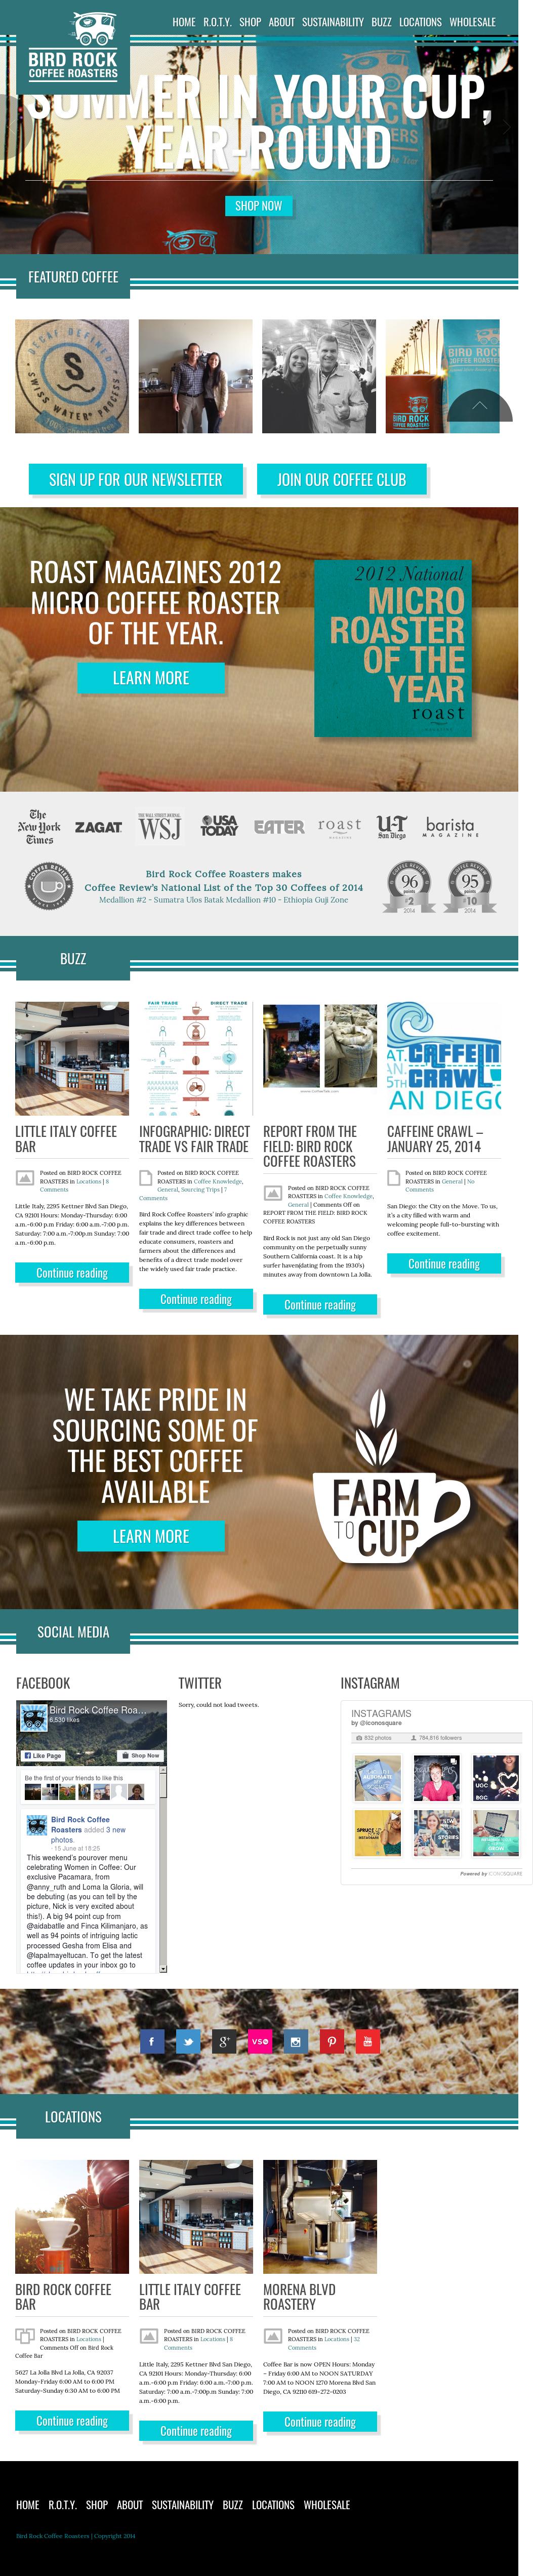 Birdrockcoffee Competitors, Revenue and Employees - Owler